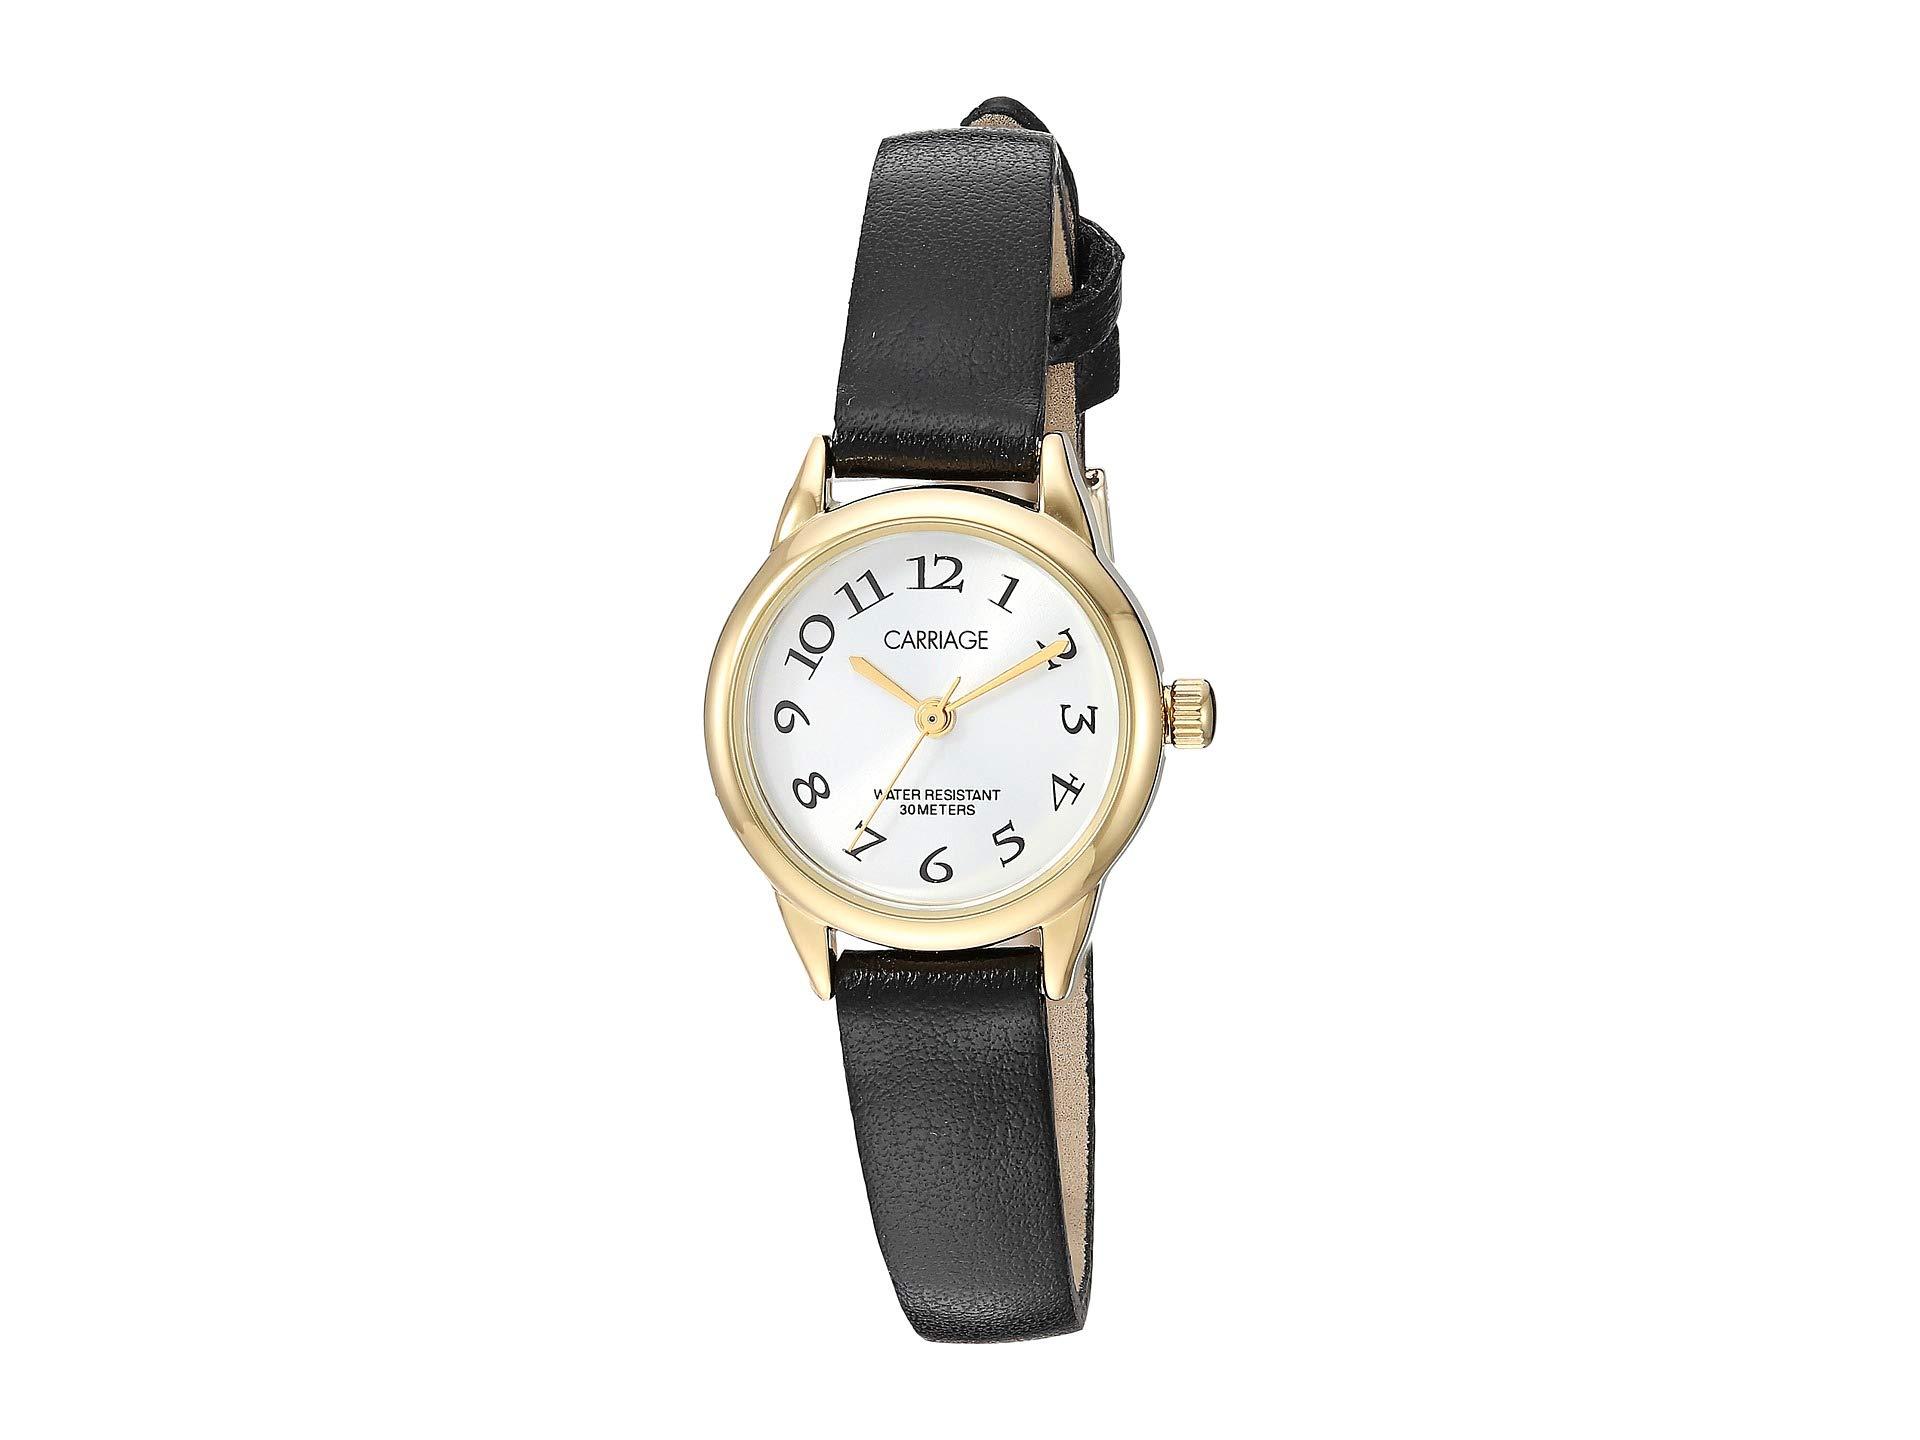 Reloj para Mujer Timex Carriage  + Timex en VeoyCompro.net